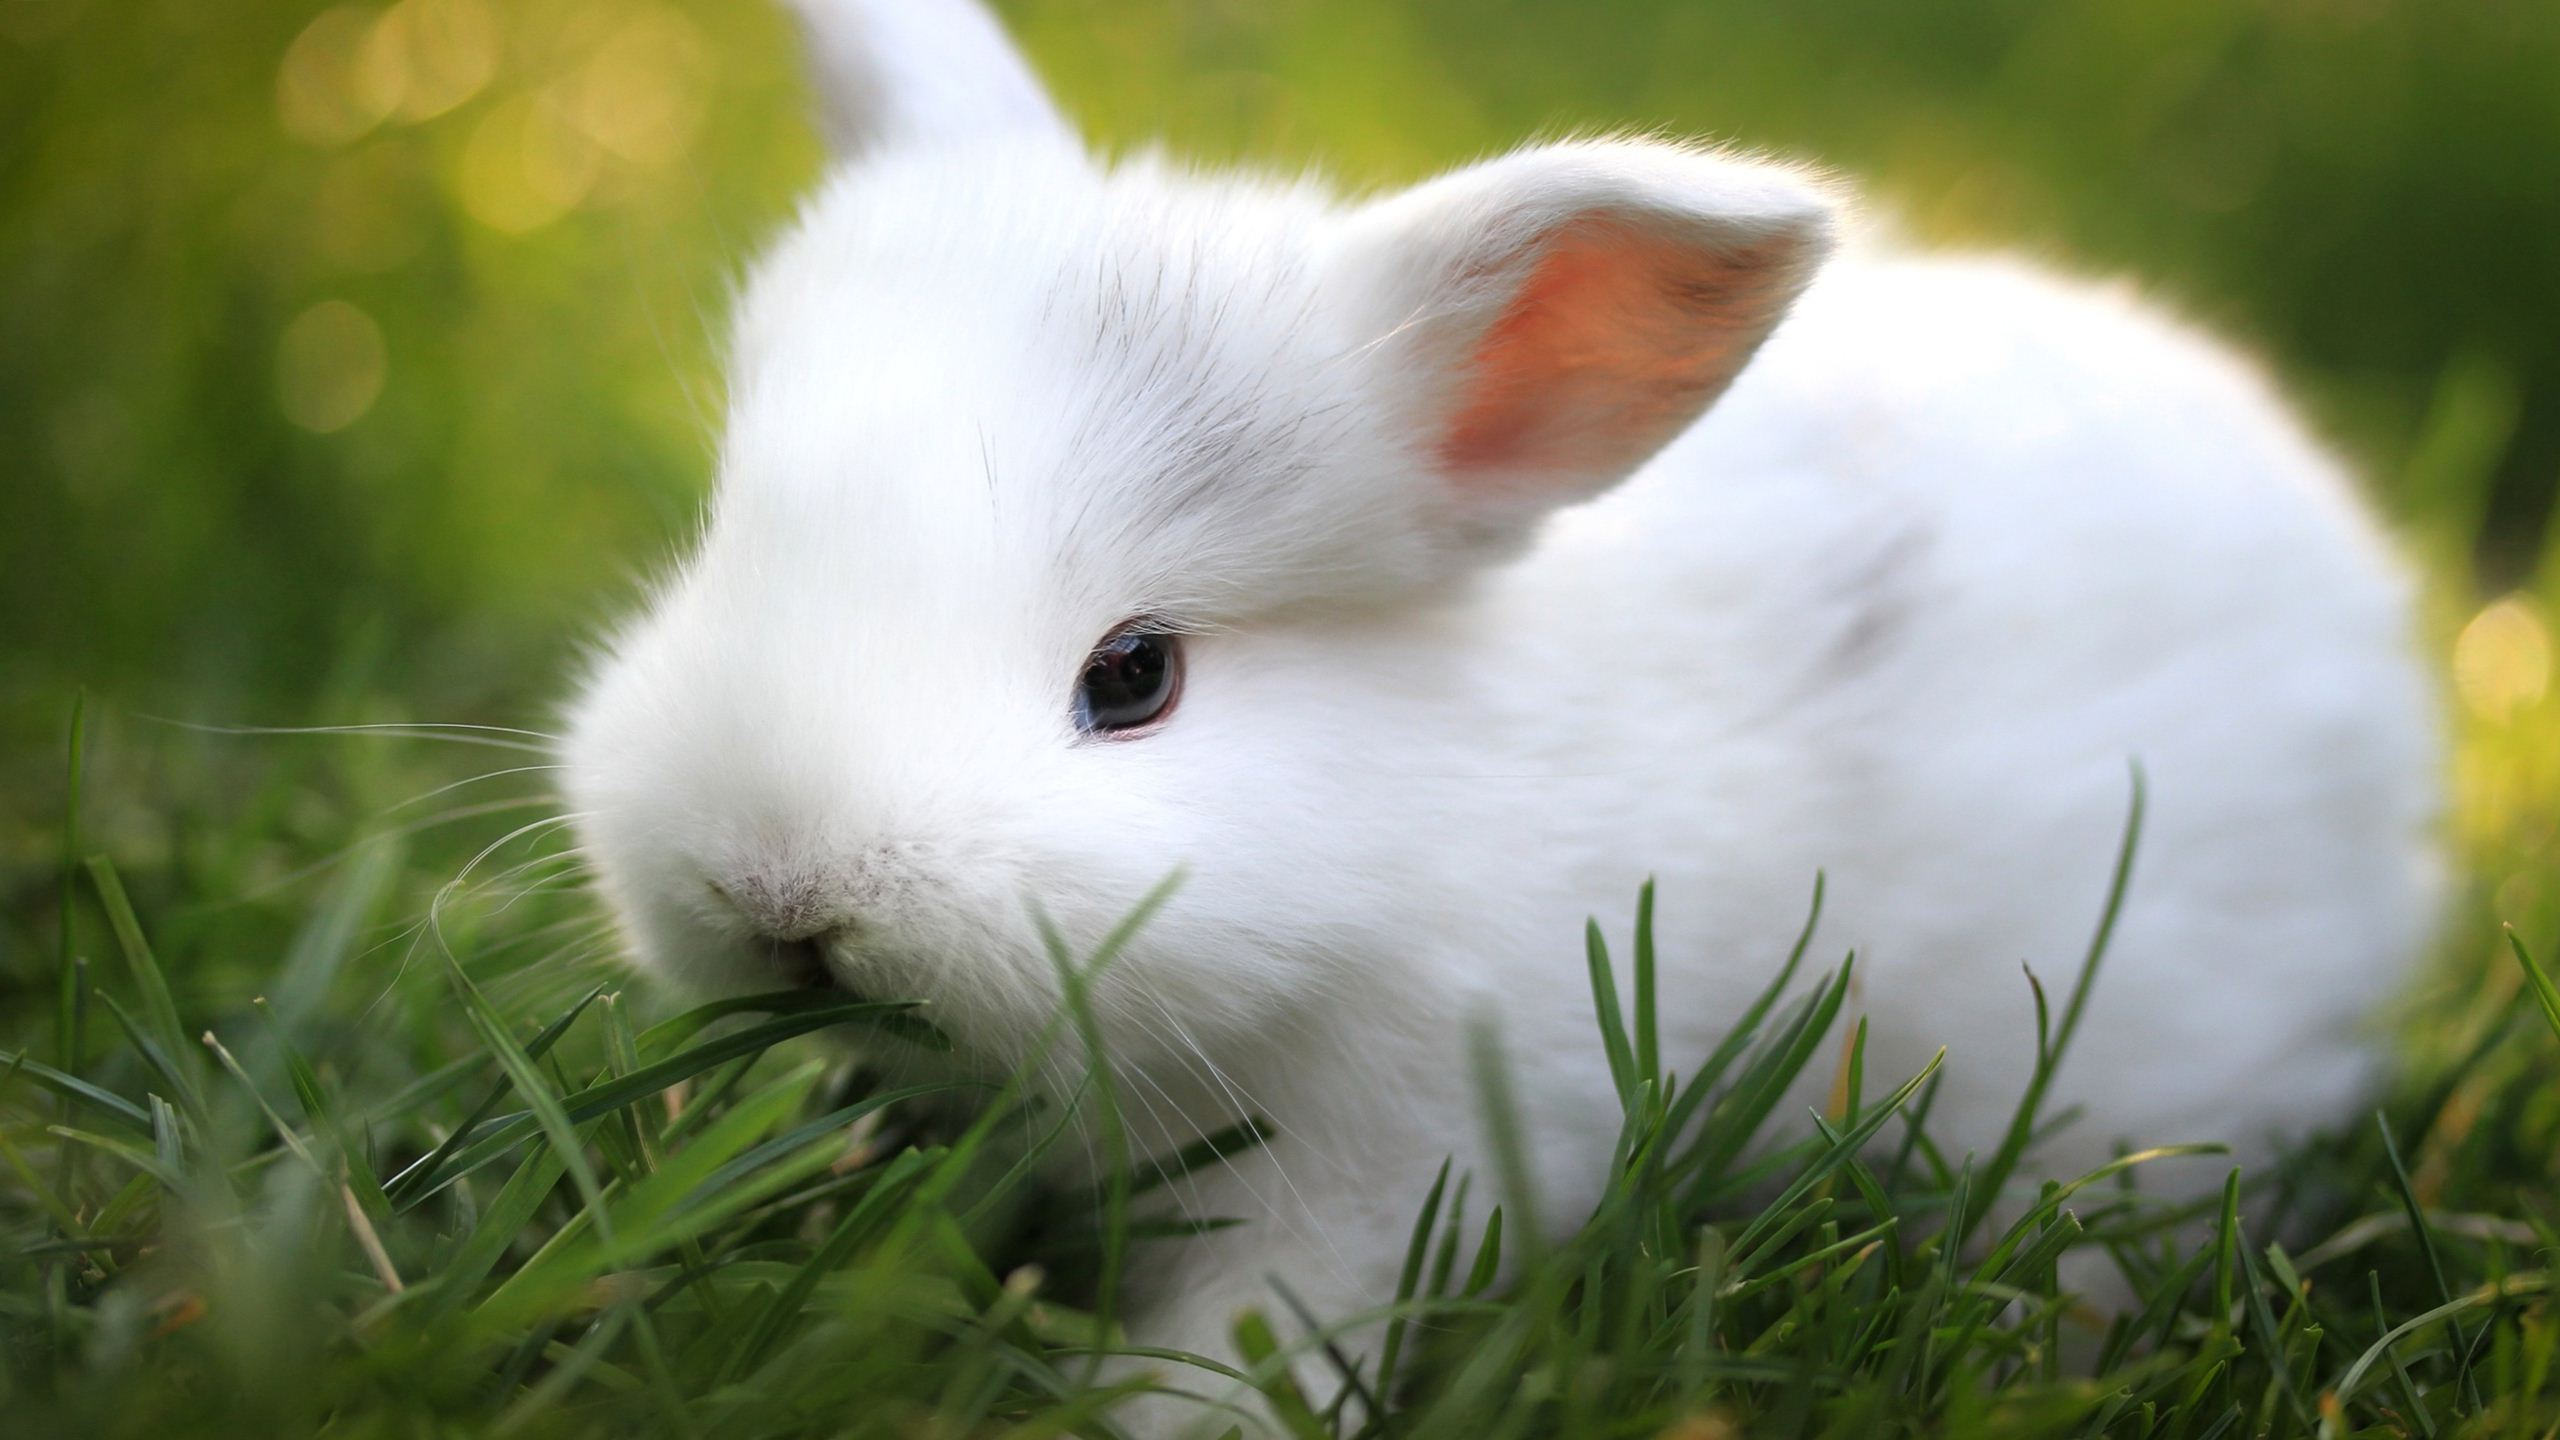 [27+] Cute White Baby Rabbit Wallpaper on WallpaperSafari